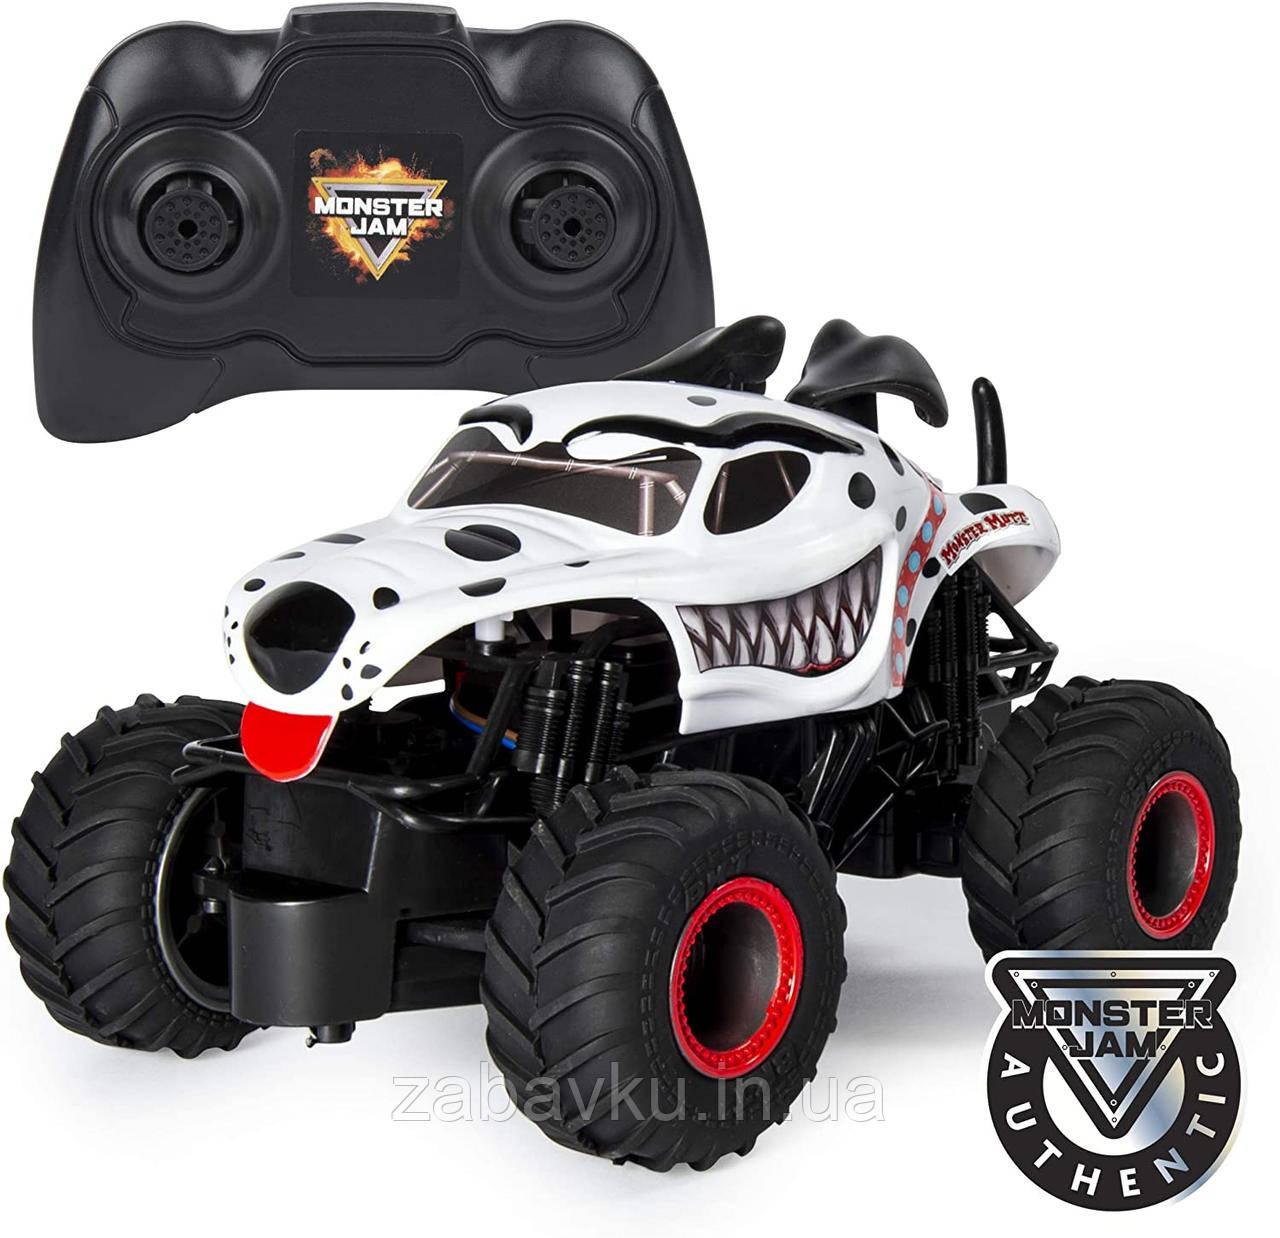 Monster Jam Внедорожник на пульте 1:24 Монстер Джем Трак Hot Wheels Monster Truck Mutt Dalmatia джип